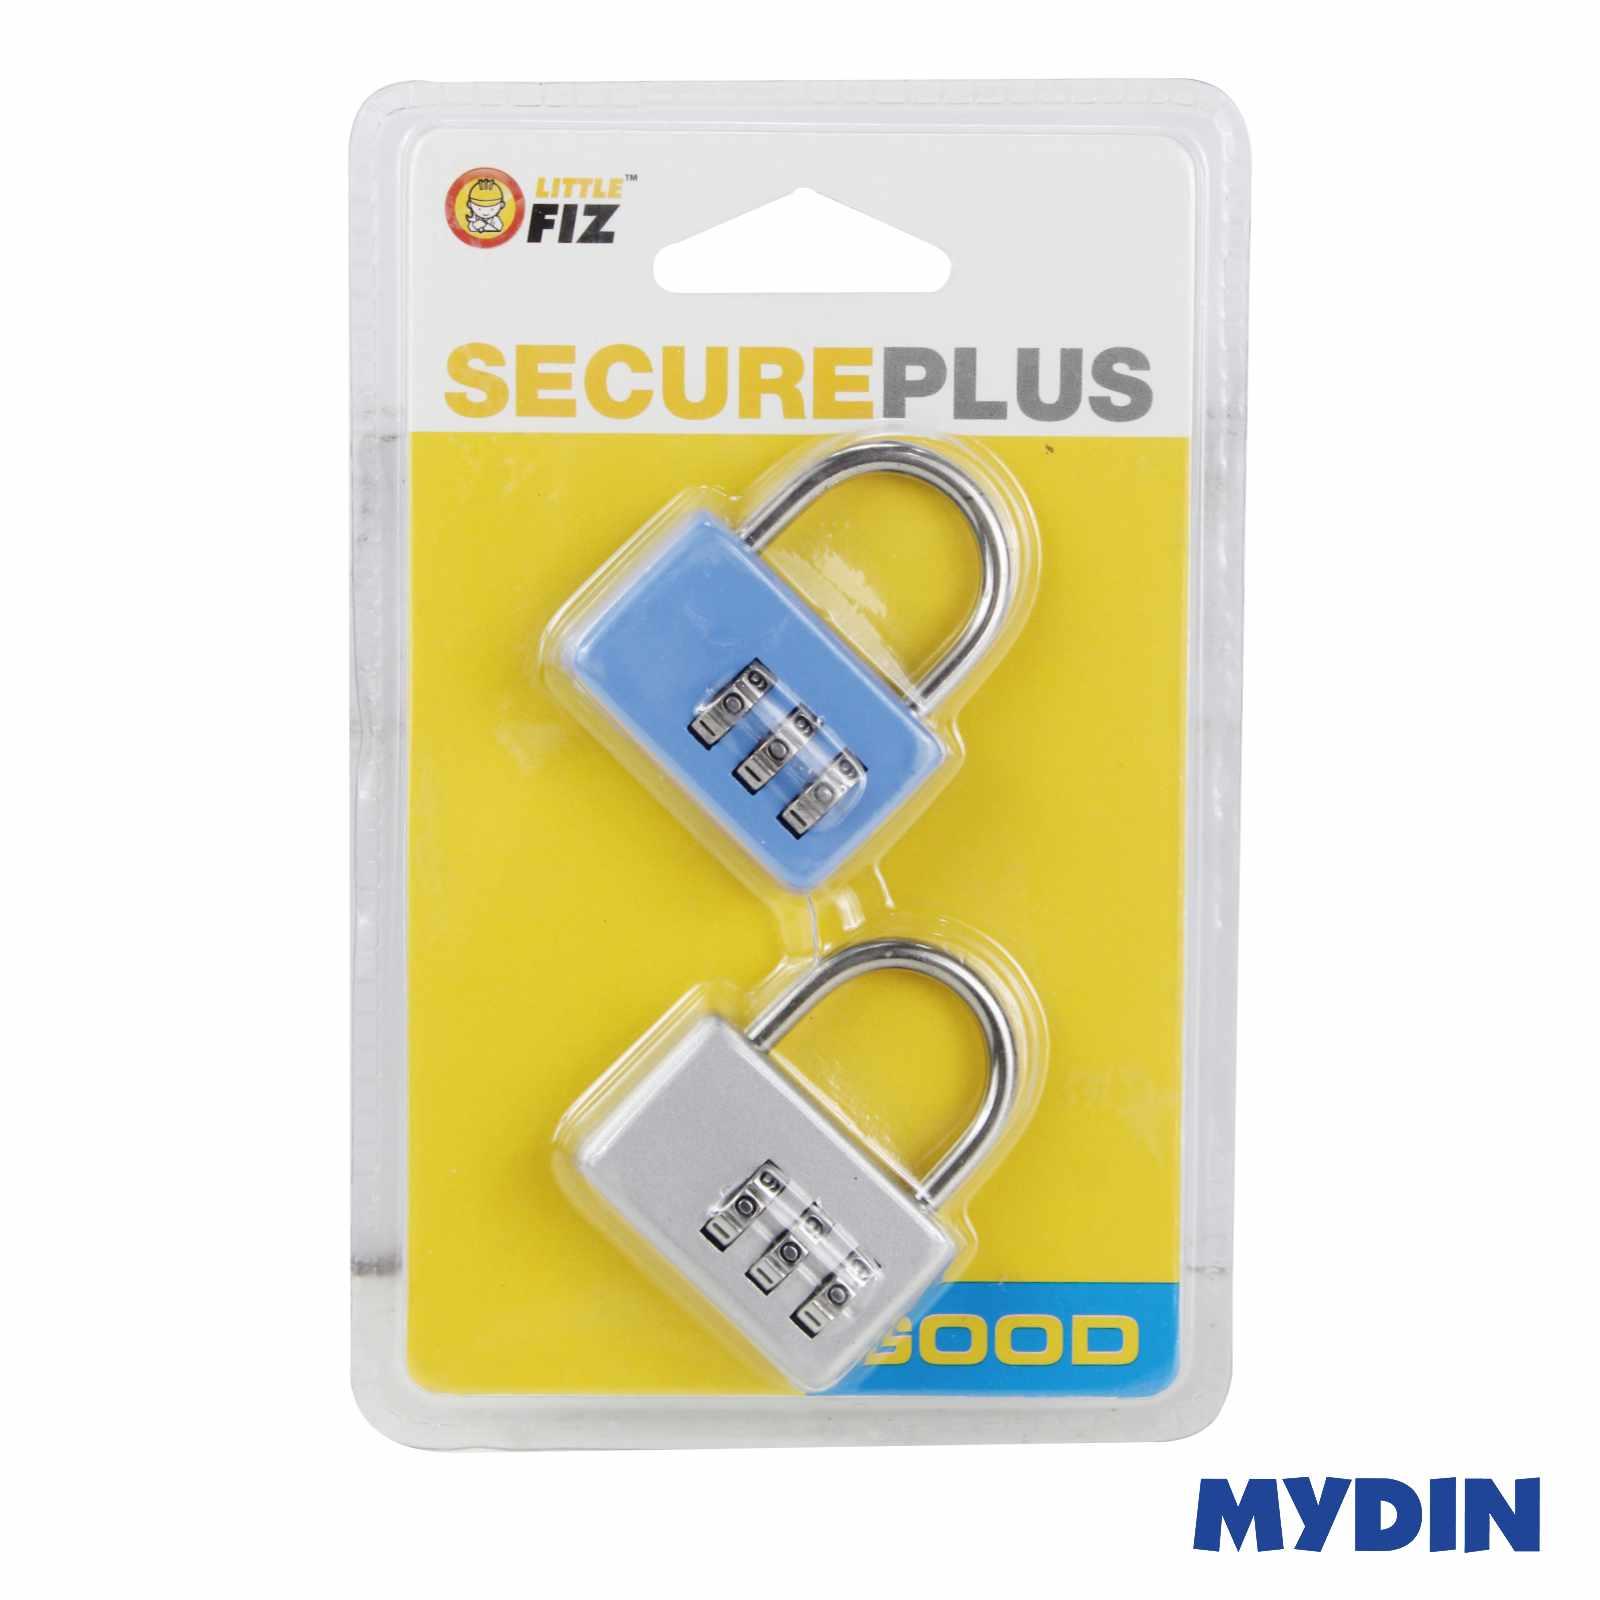 Little Fiz Secure Plus Combination Padlock 2 In 1